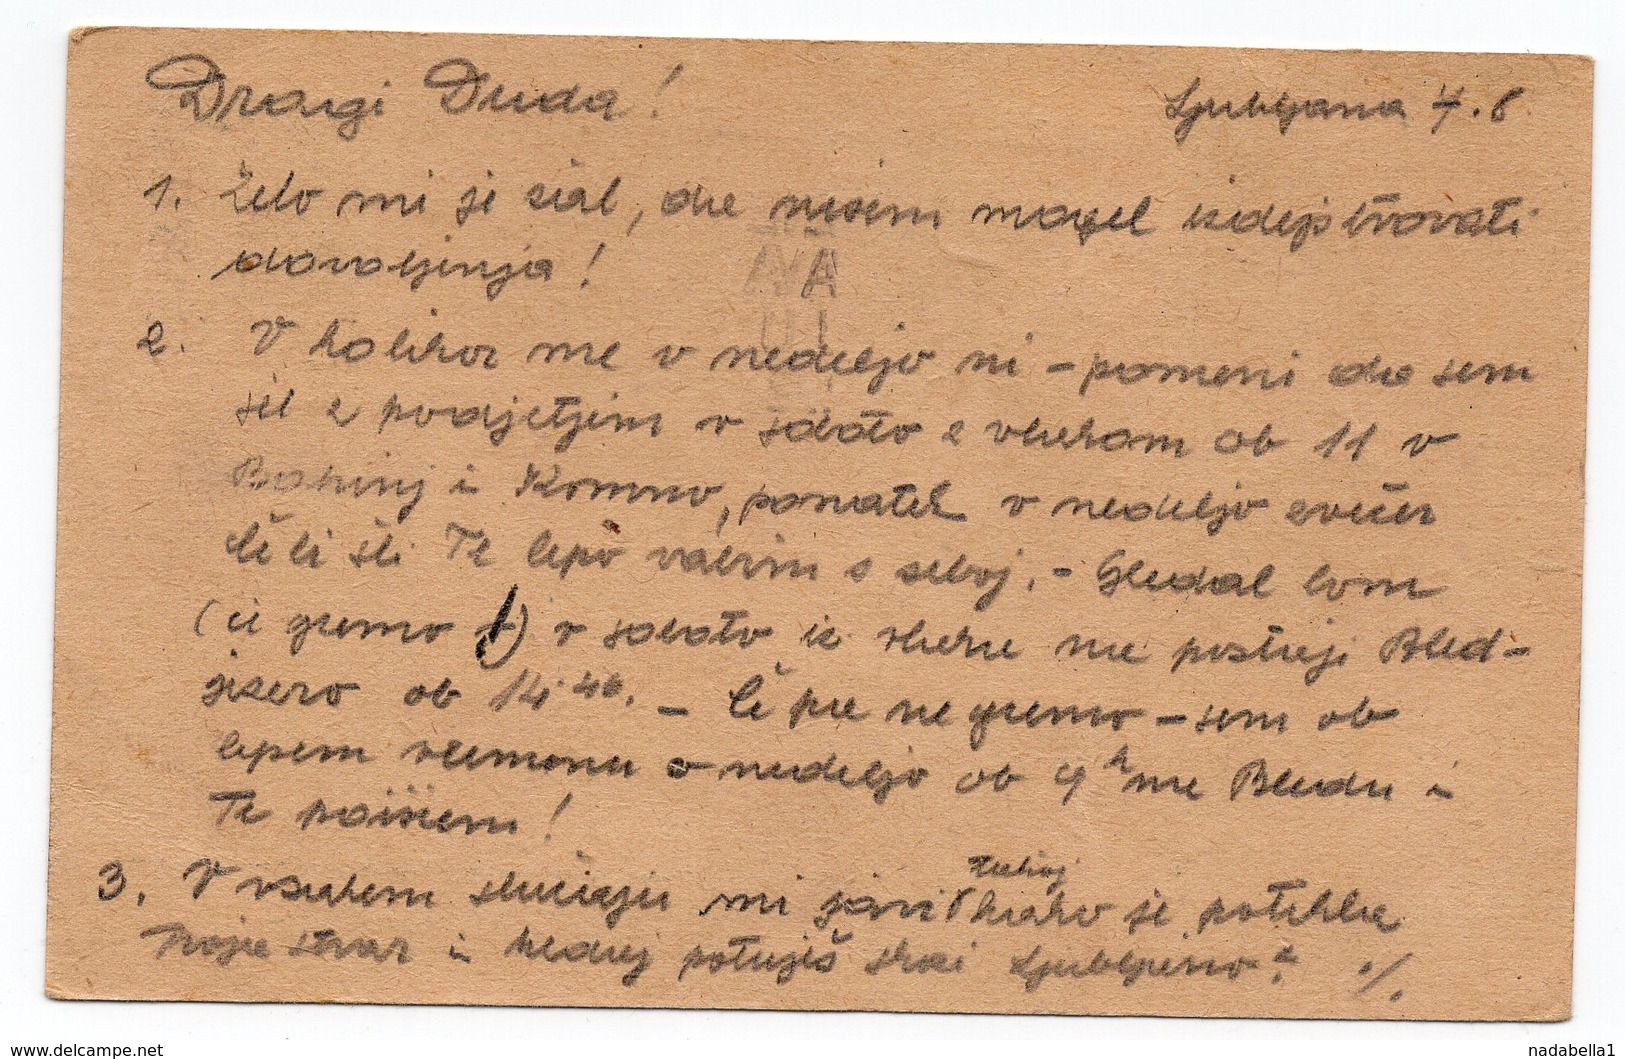 1952 YUGOSLAVIA, SLOVENIA, LJUBLJANA, BLED, POST RESTANT, POSTAGE DUE, FLAM - Postage Due